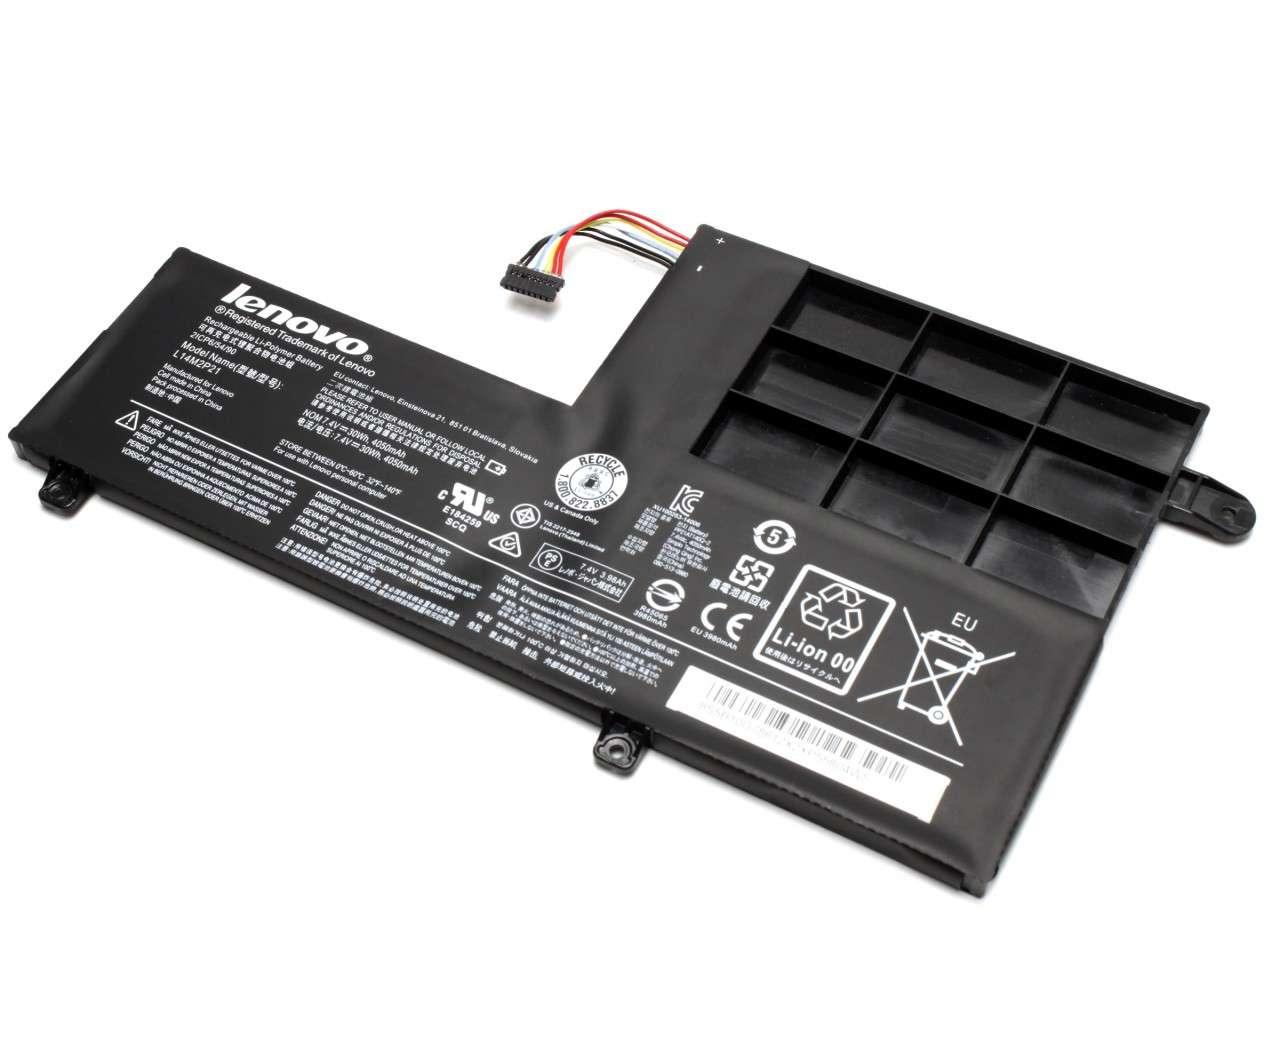 Baterie Lenovo U41-70 Originala 30Wh/4050mAh 2 celule imagine powerlaptop.ro 2021